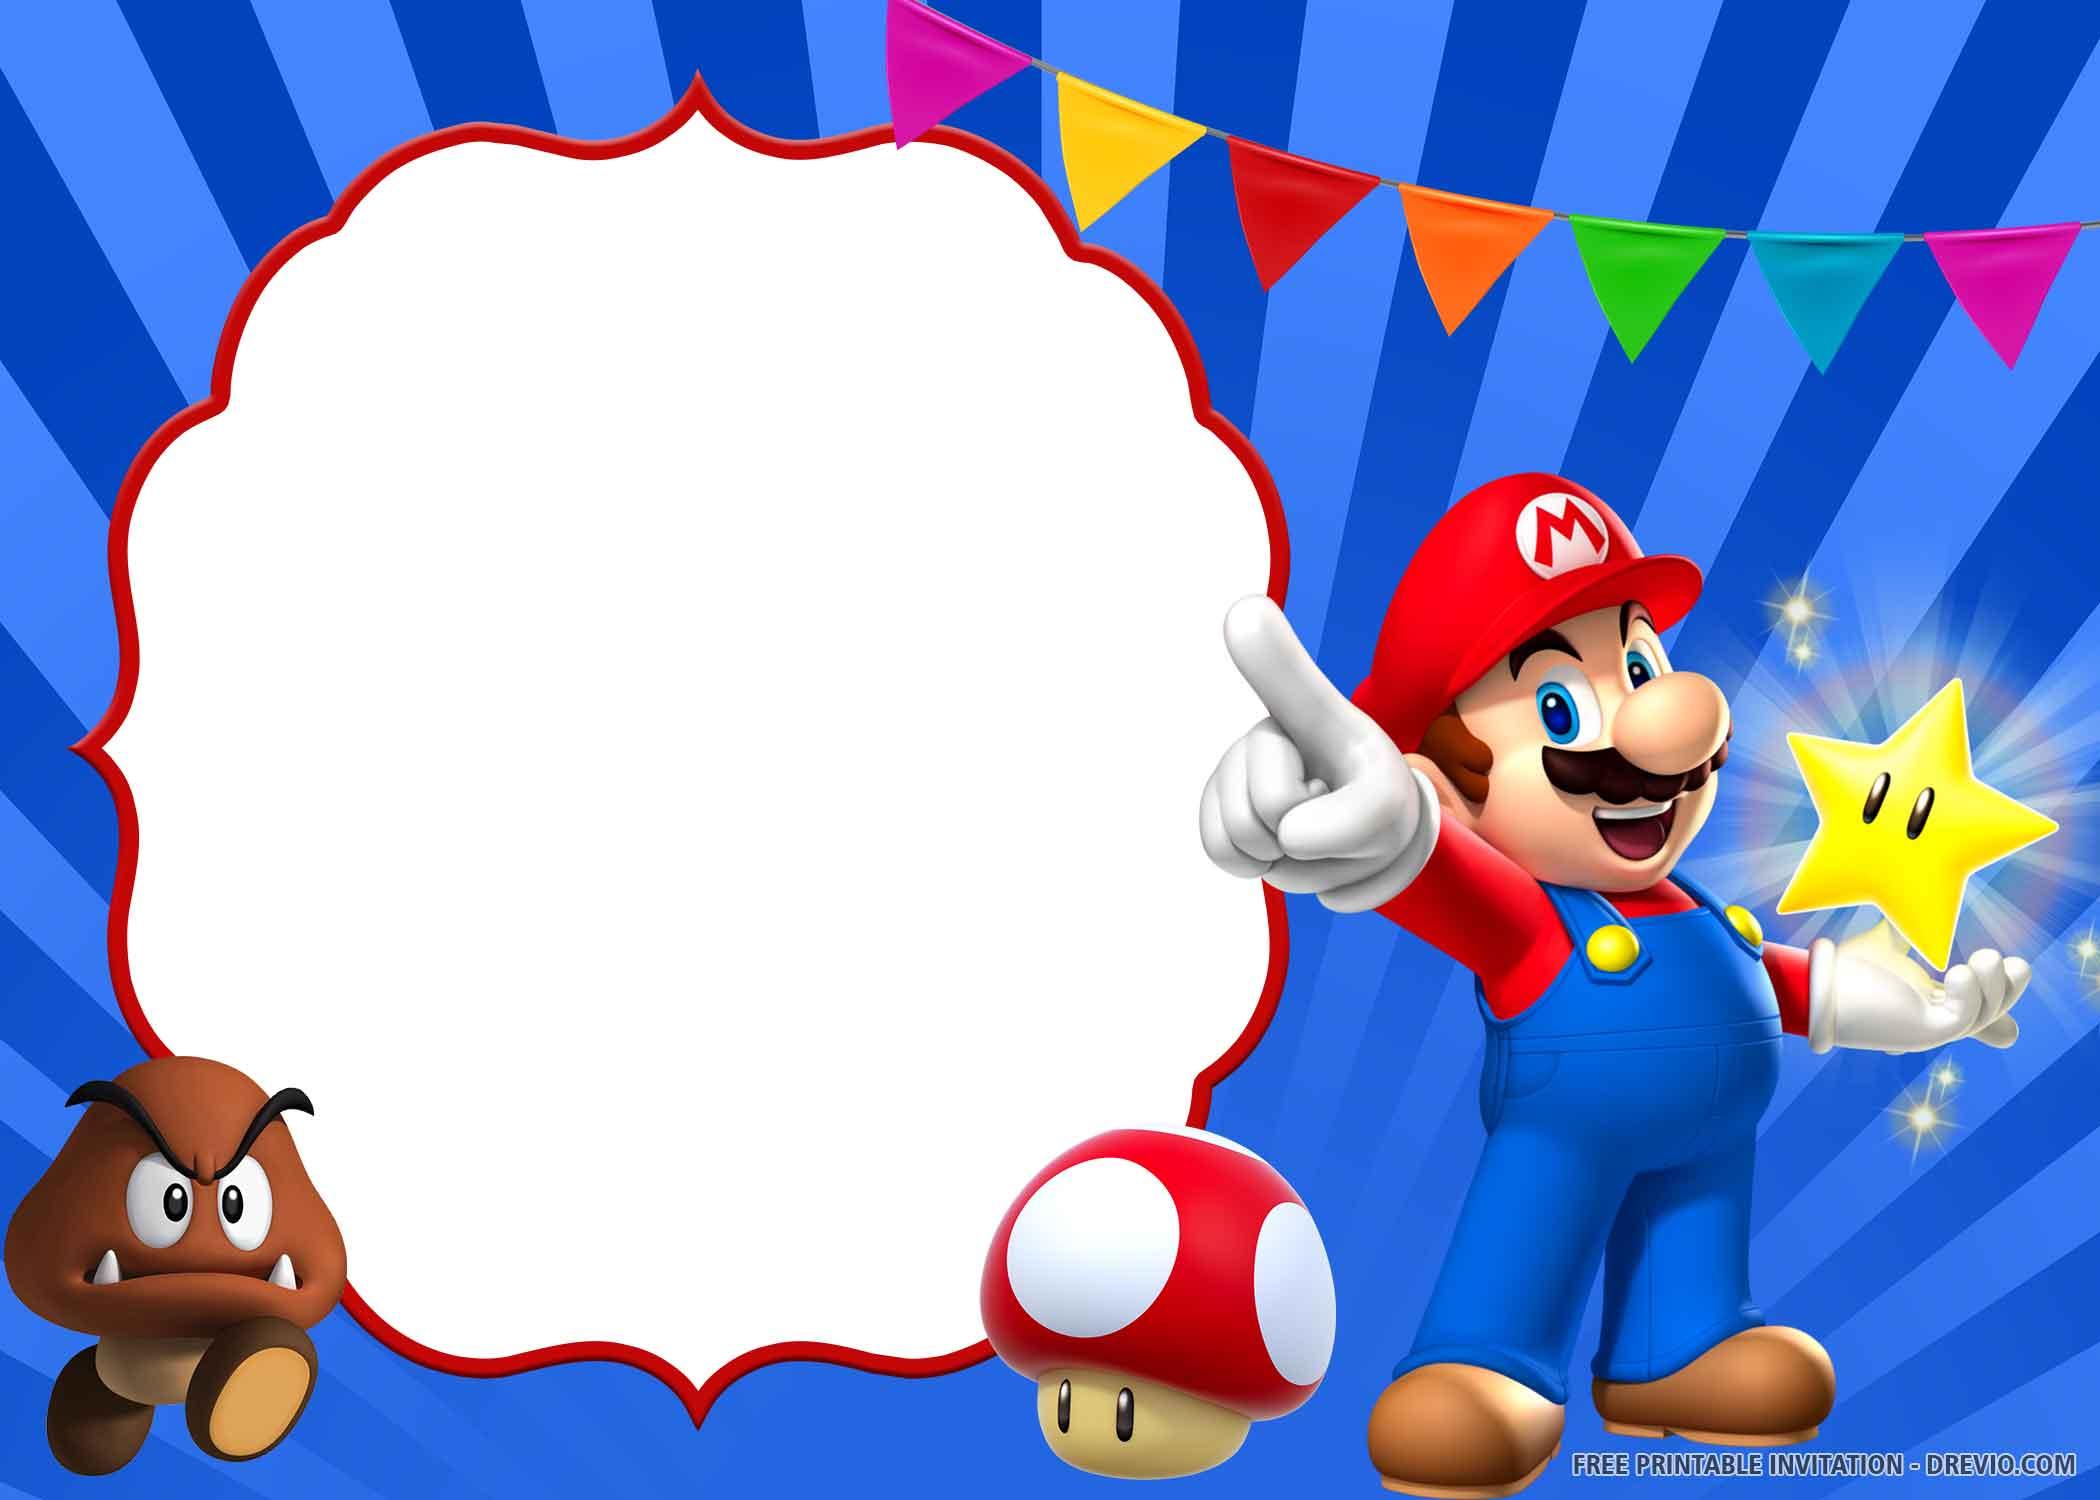 Free Printable Super Mario Birthday Invitation